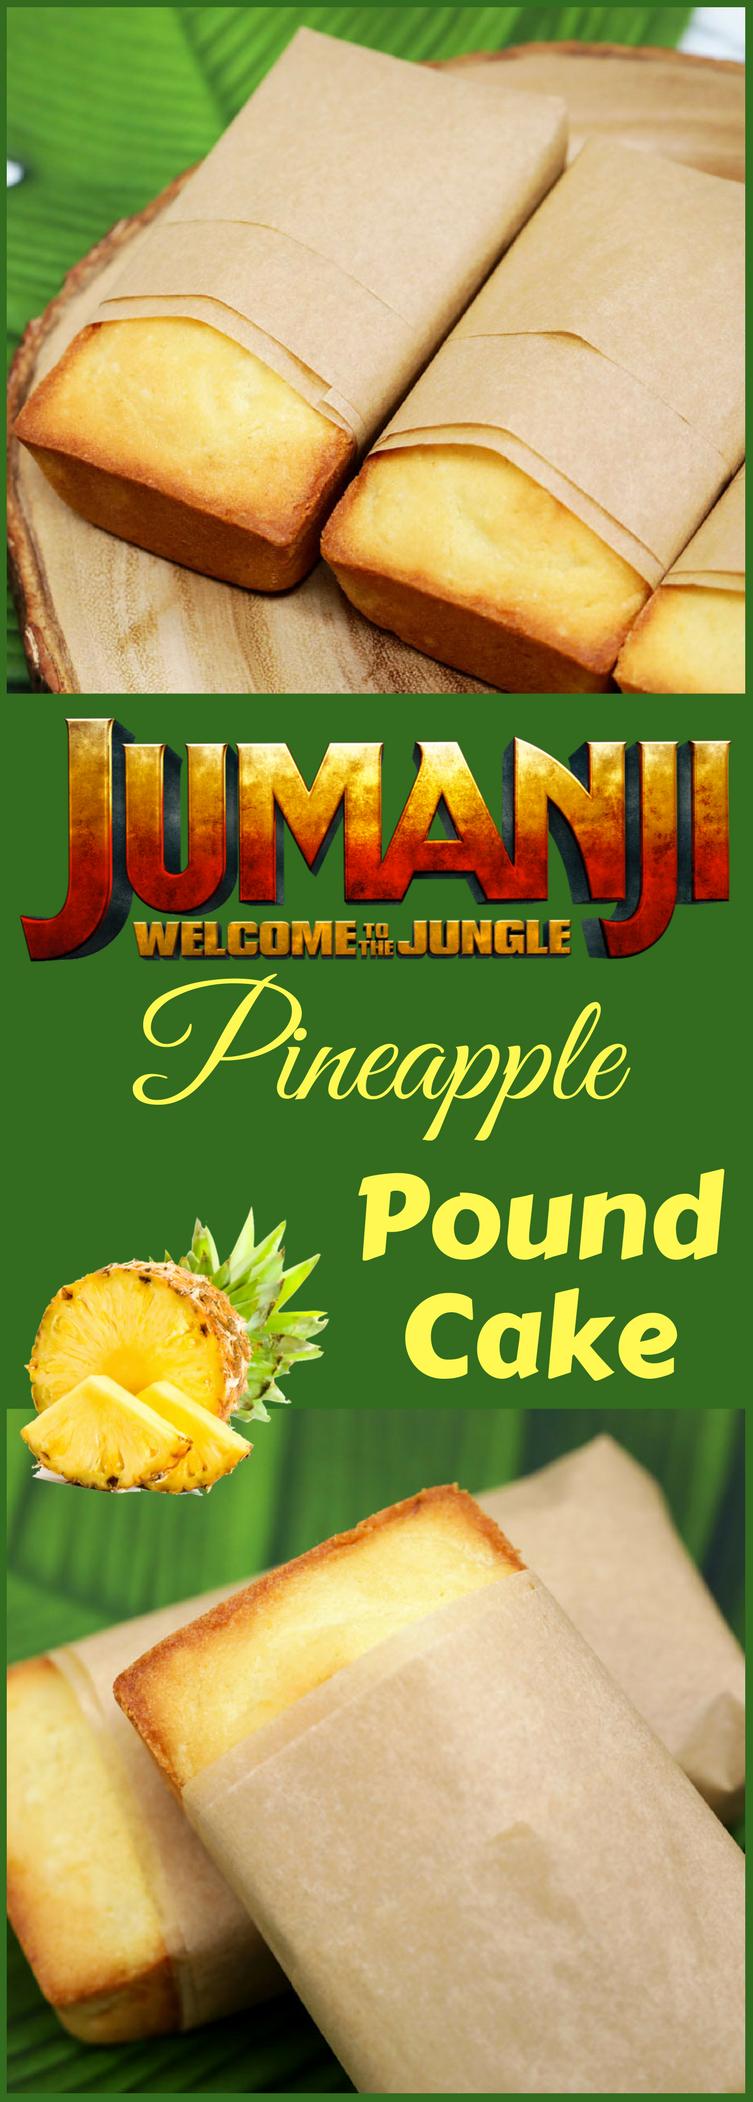 Jumanji Pineapple Pound Cake In 2020 Pineapple Pound Cake Food Recipes